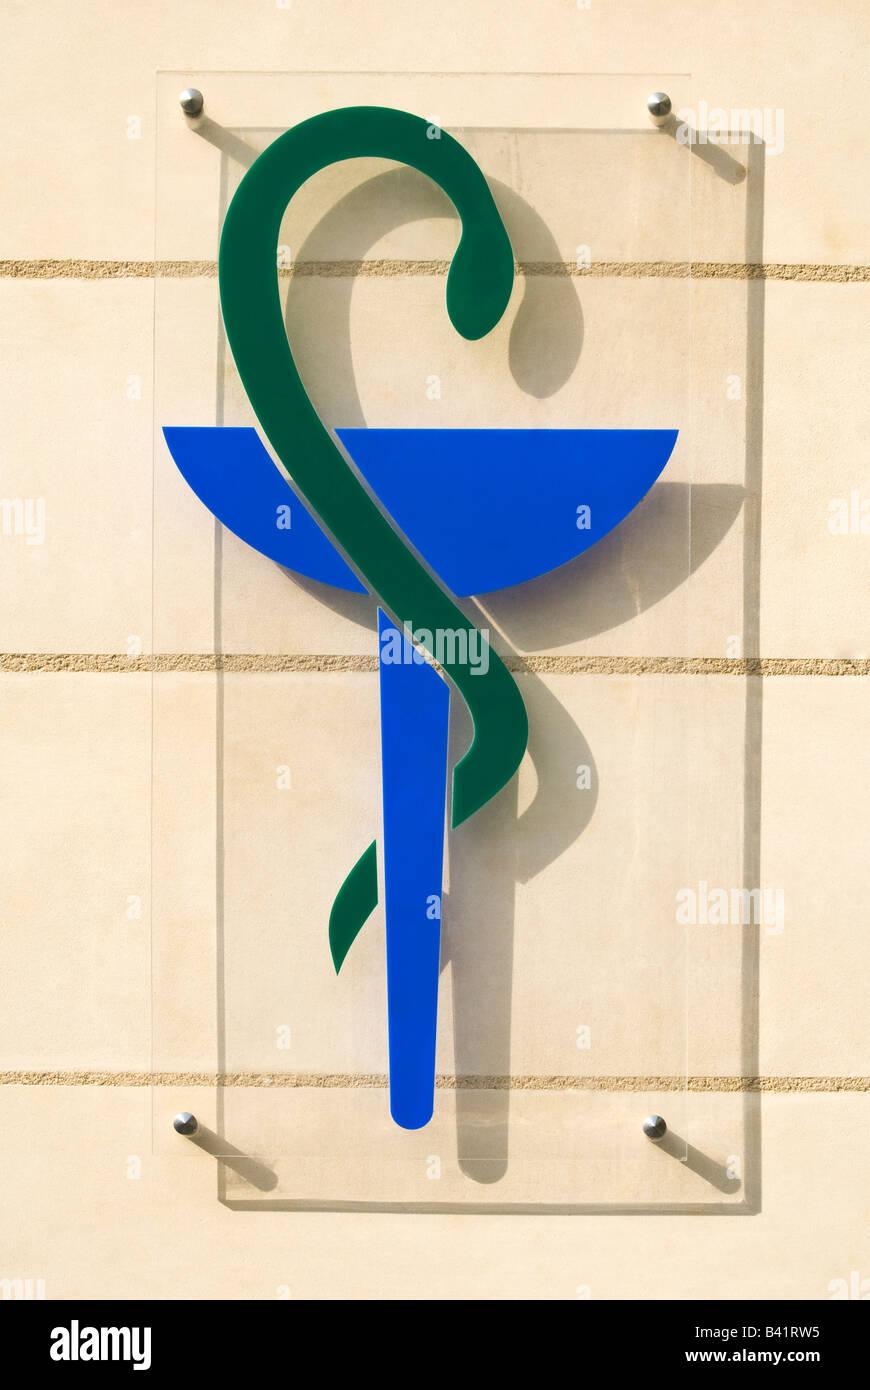 Pharmacie / Chemist's shop sign,  France. - Stock Image